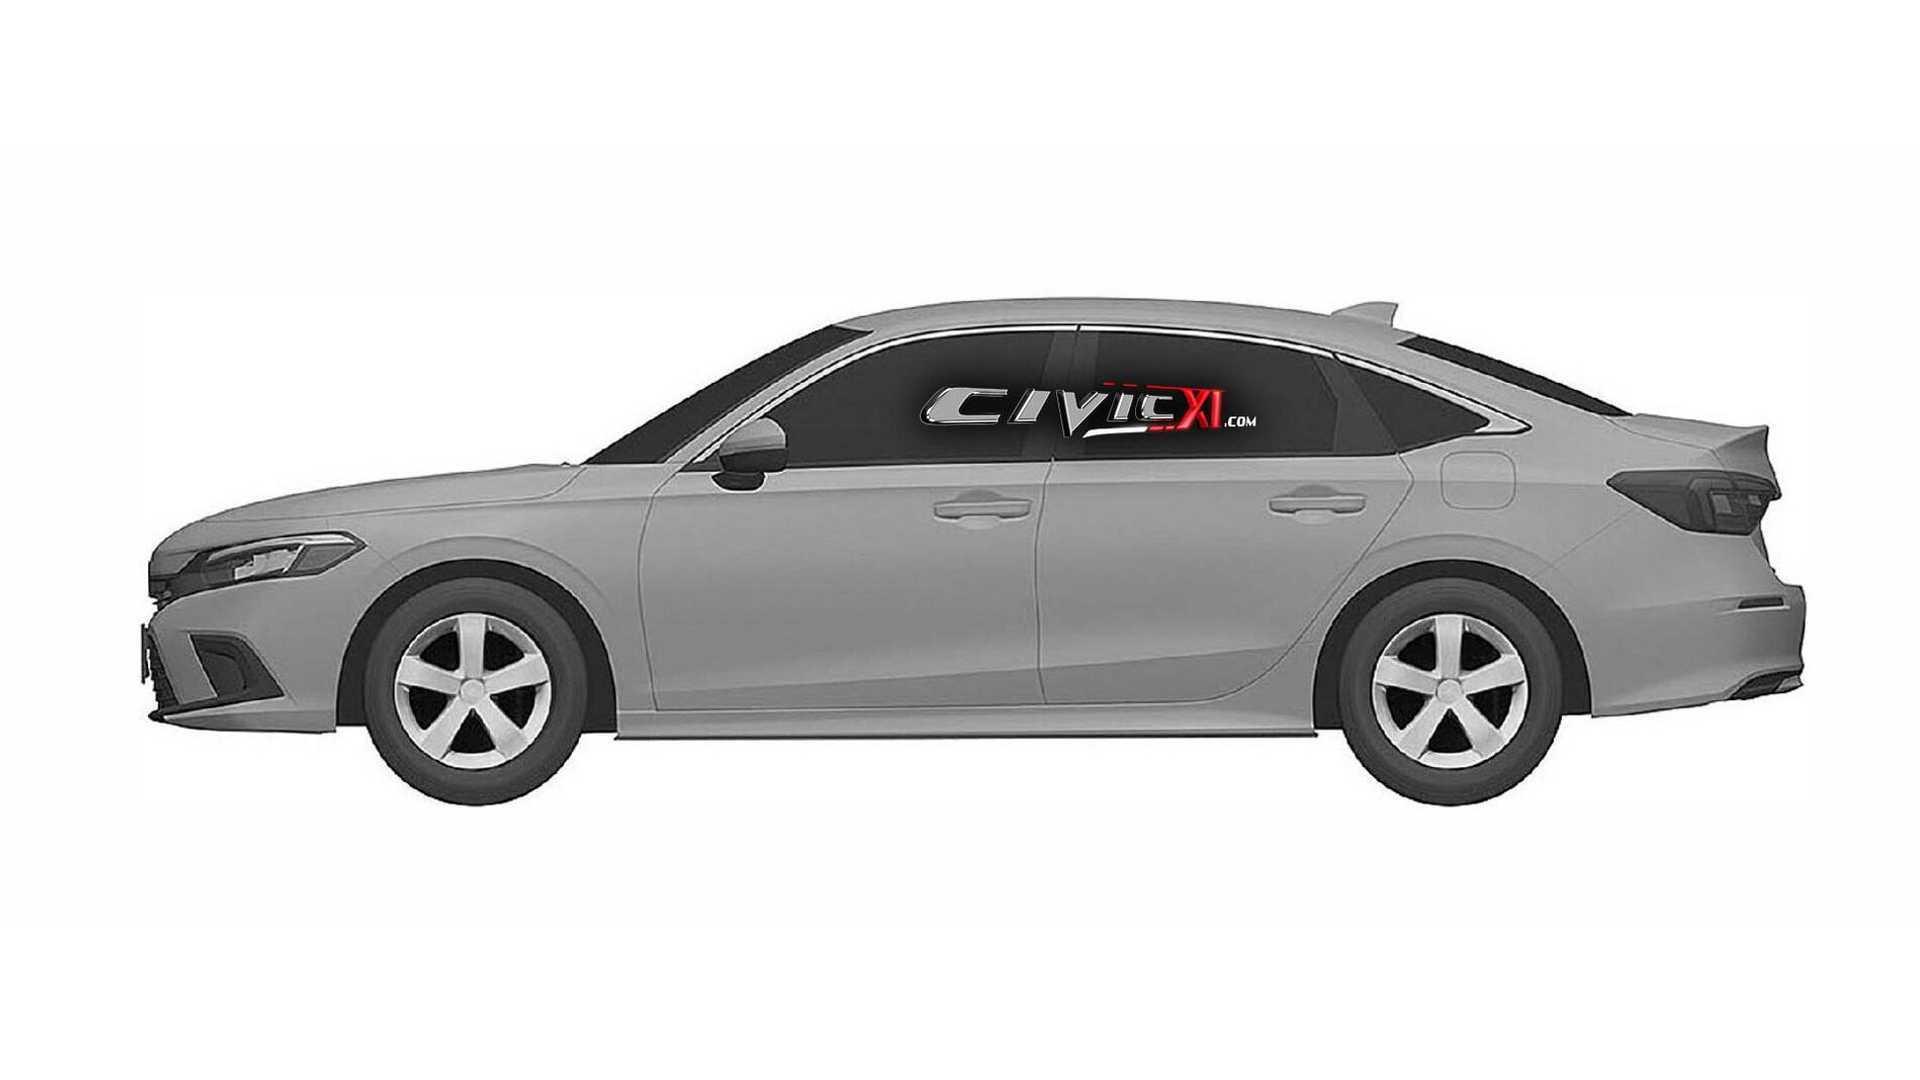 2022-honda-civic-sedan-front-view-at-patent-office